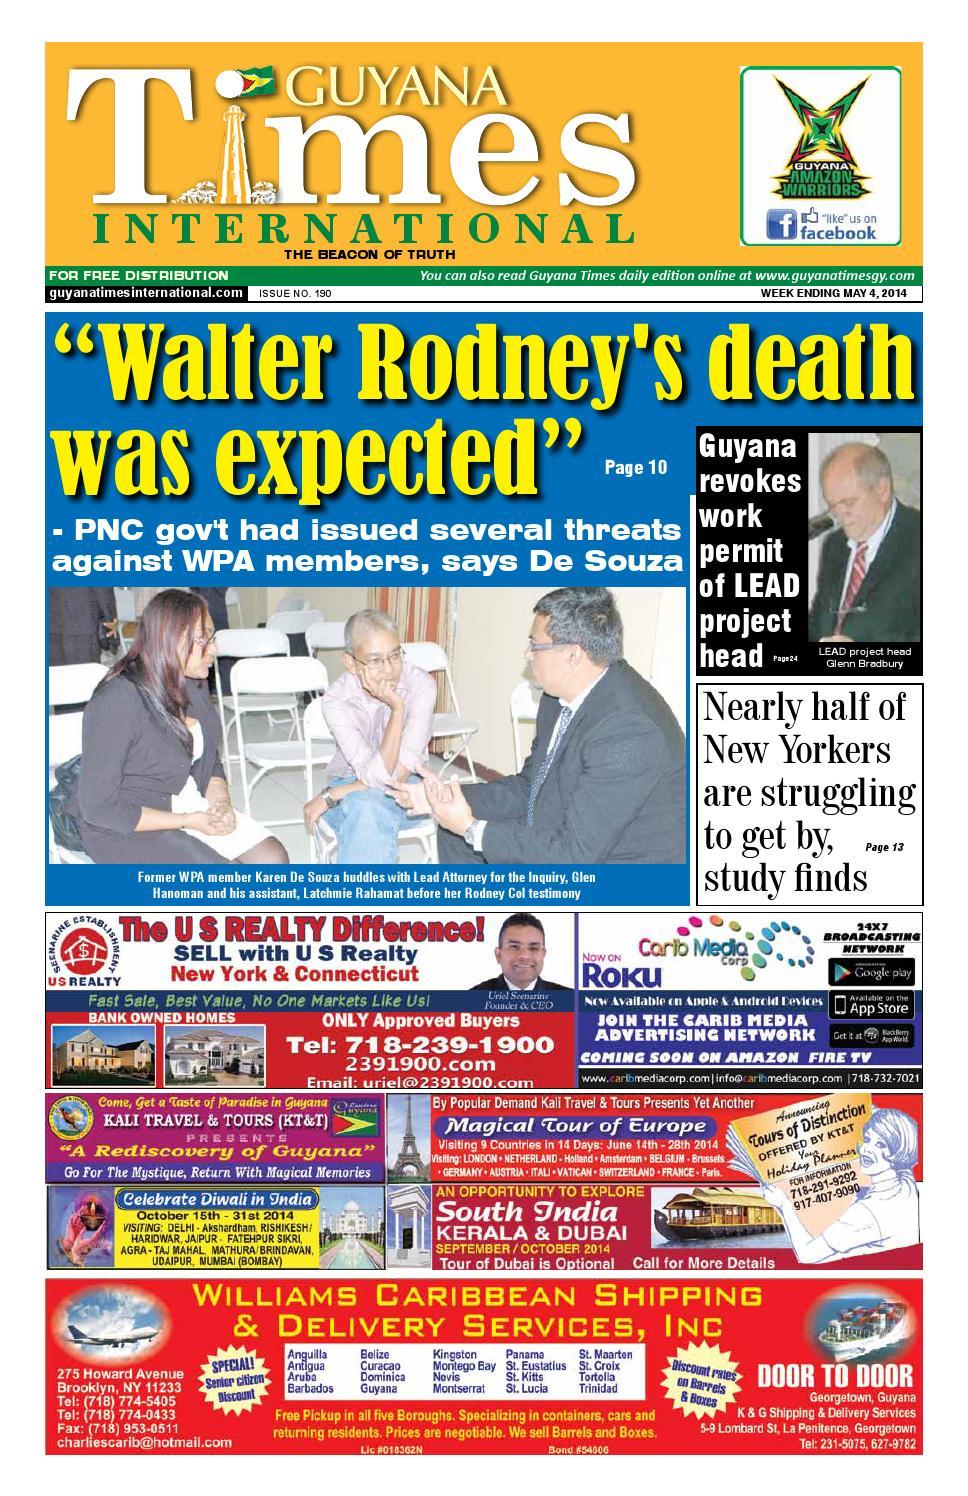 Guyana Times International by Gytimes - issuu